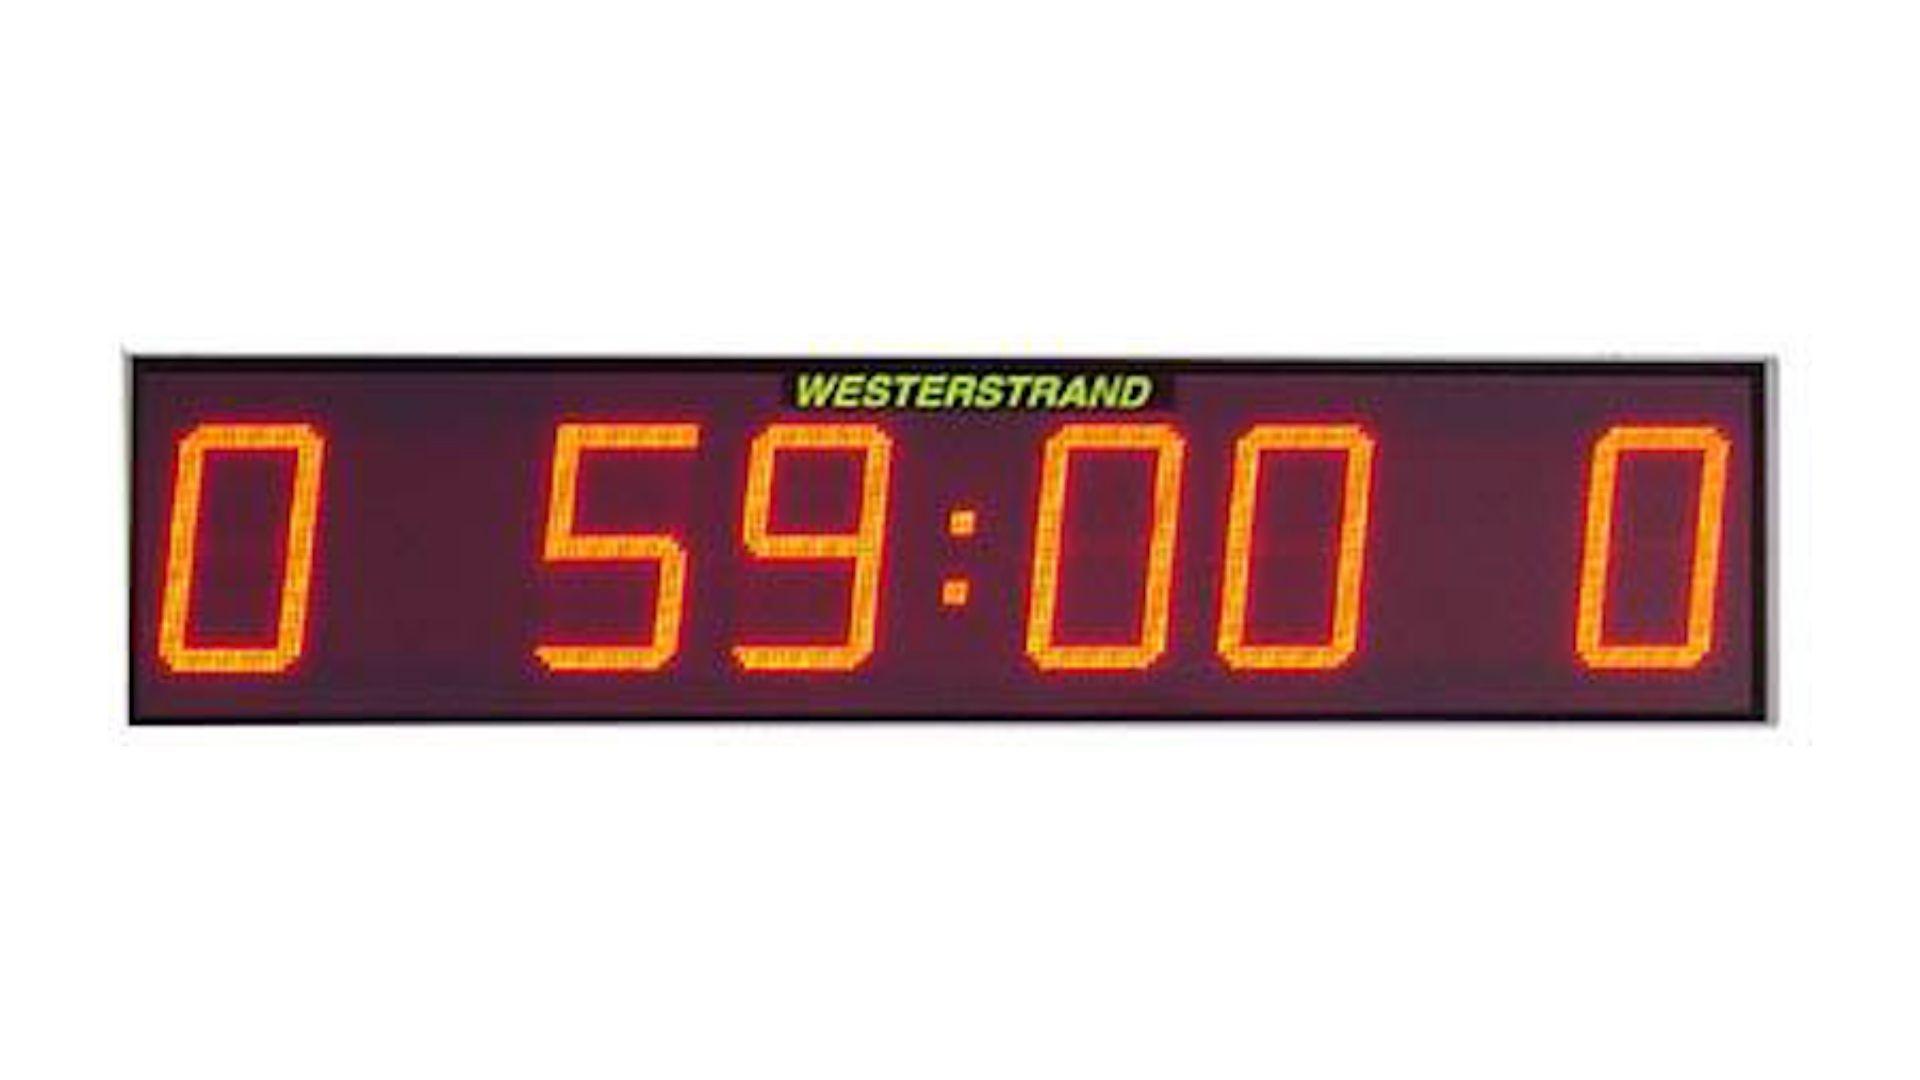 Digitaal scorebord met minuut-aanduiding